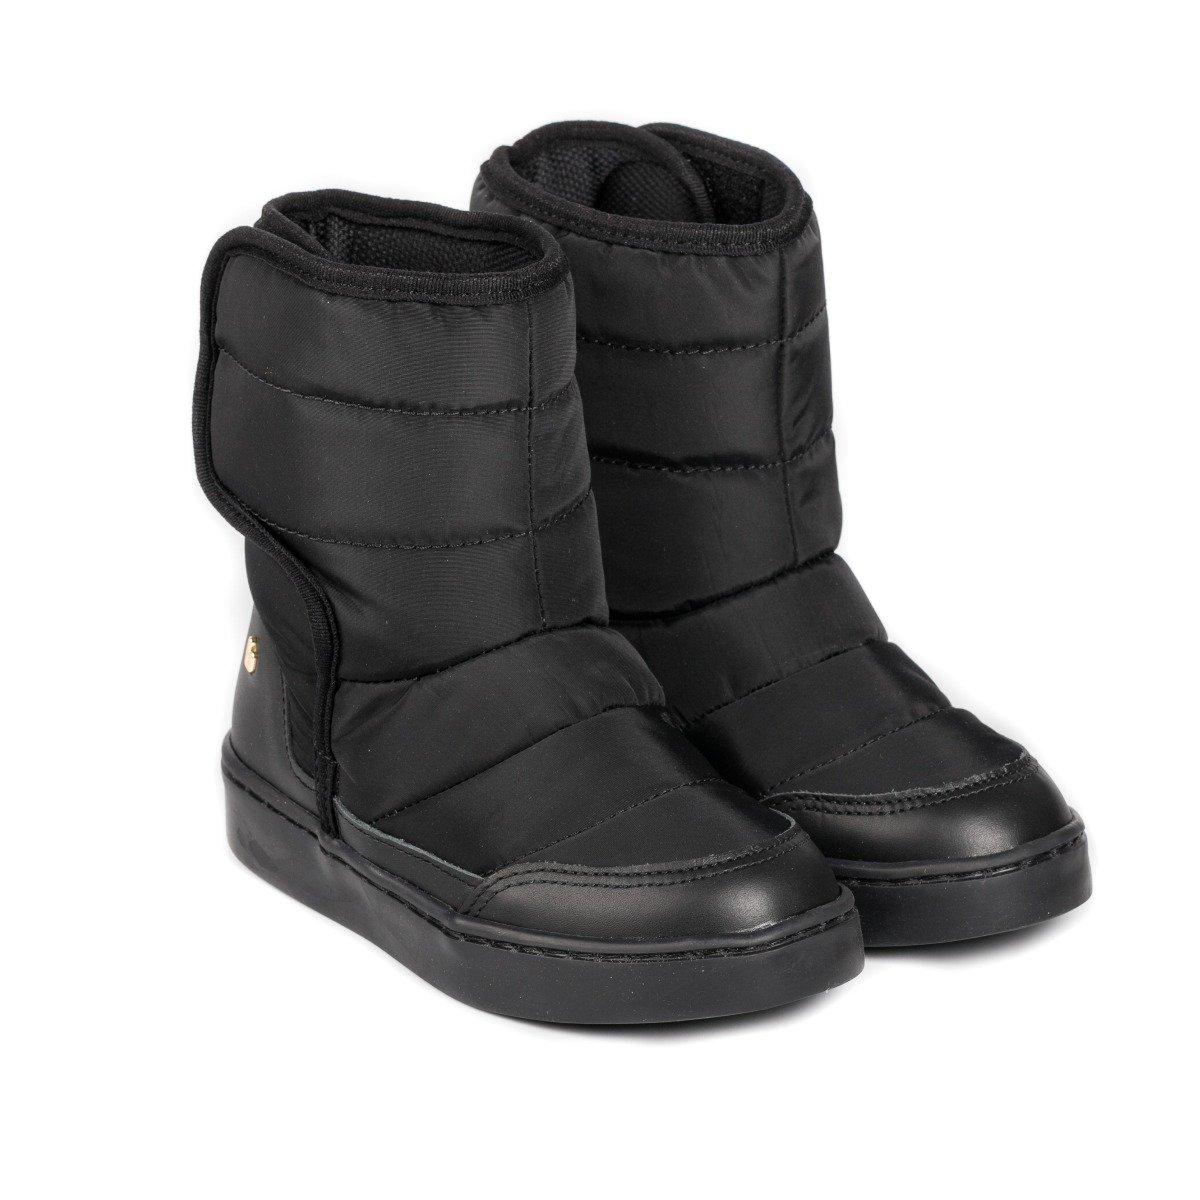 Cizme Bibi Shoes Urban New Black